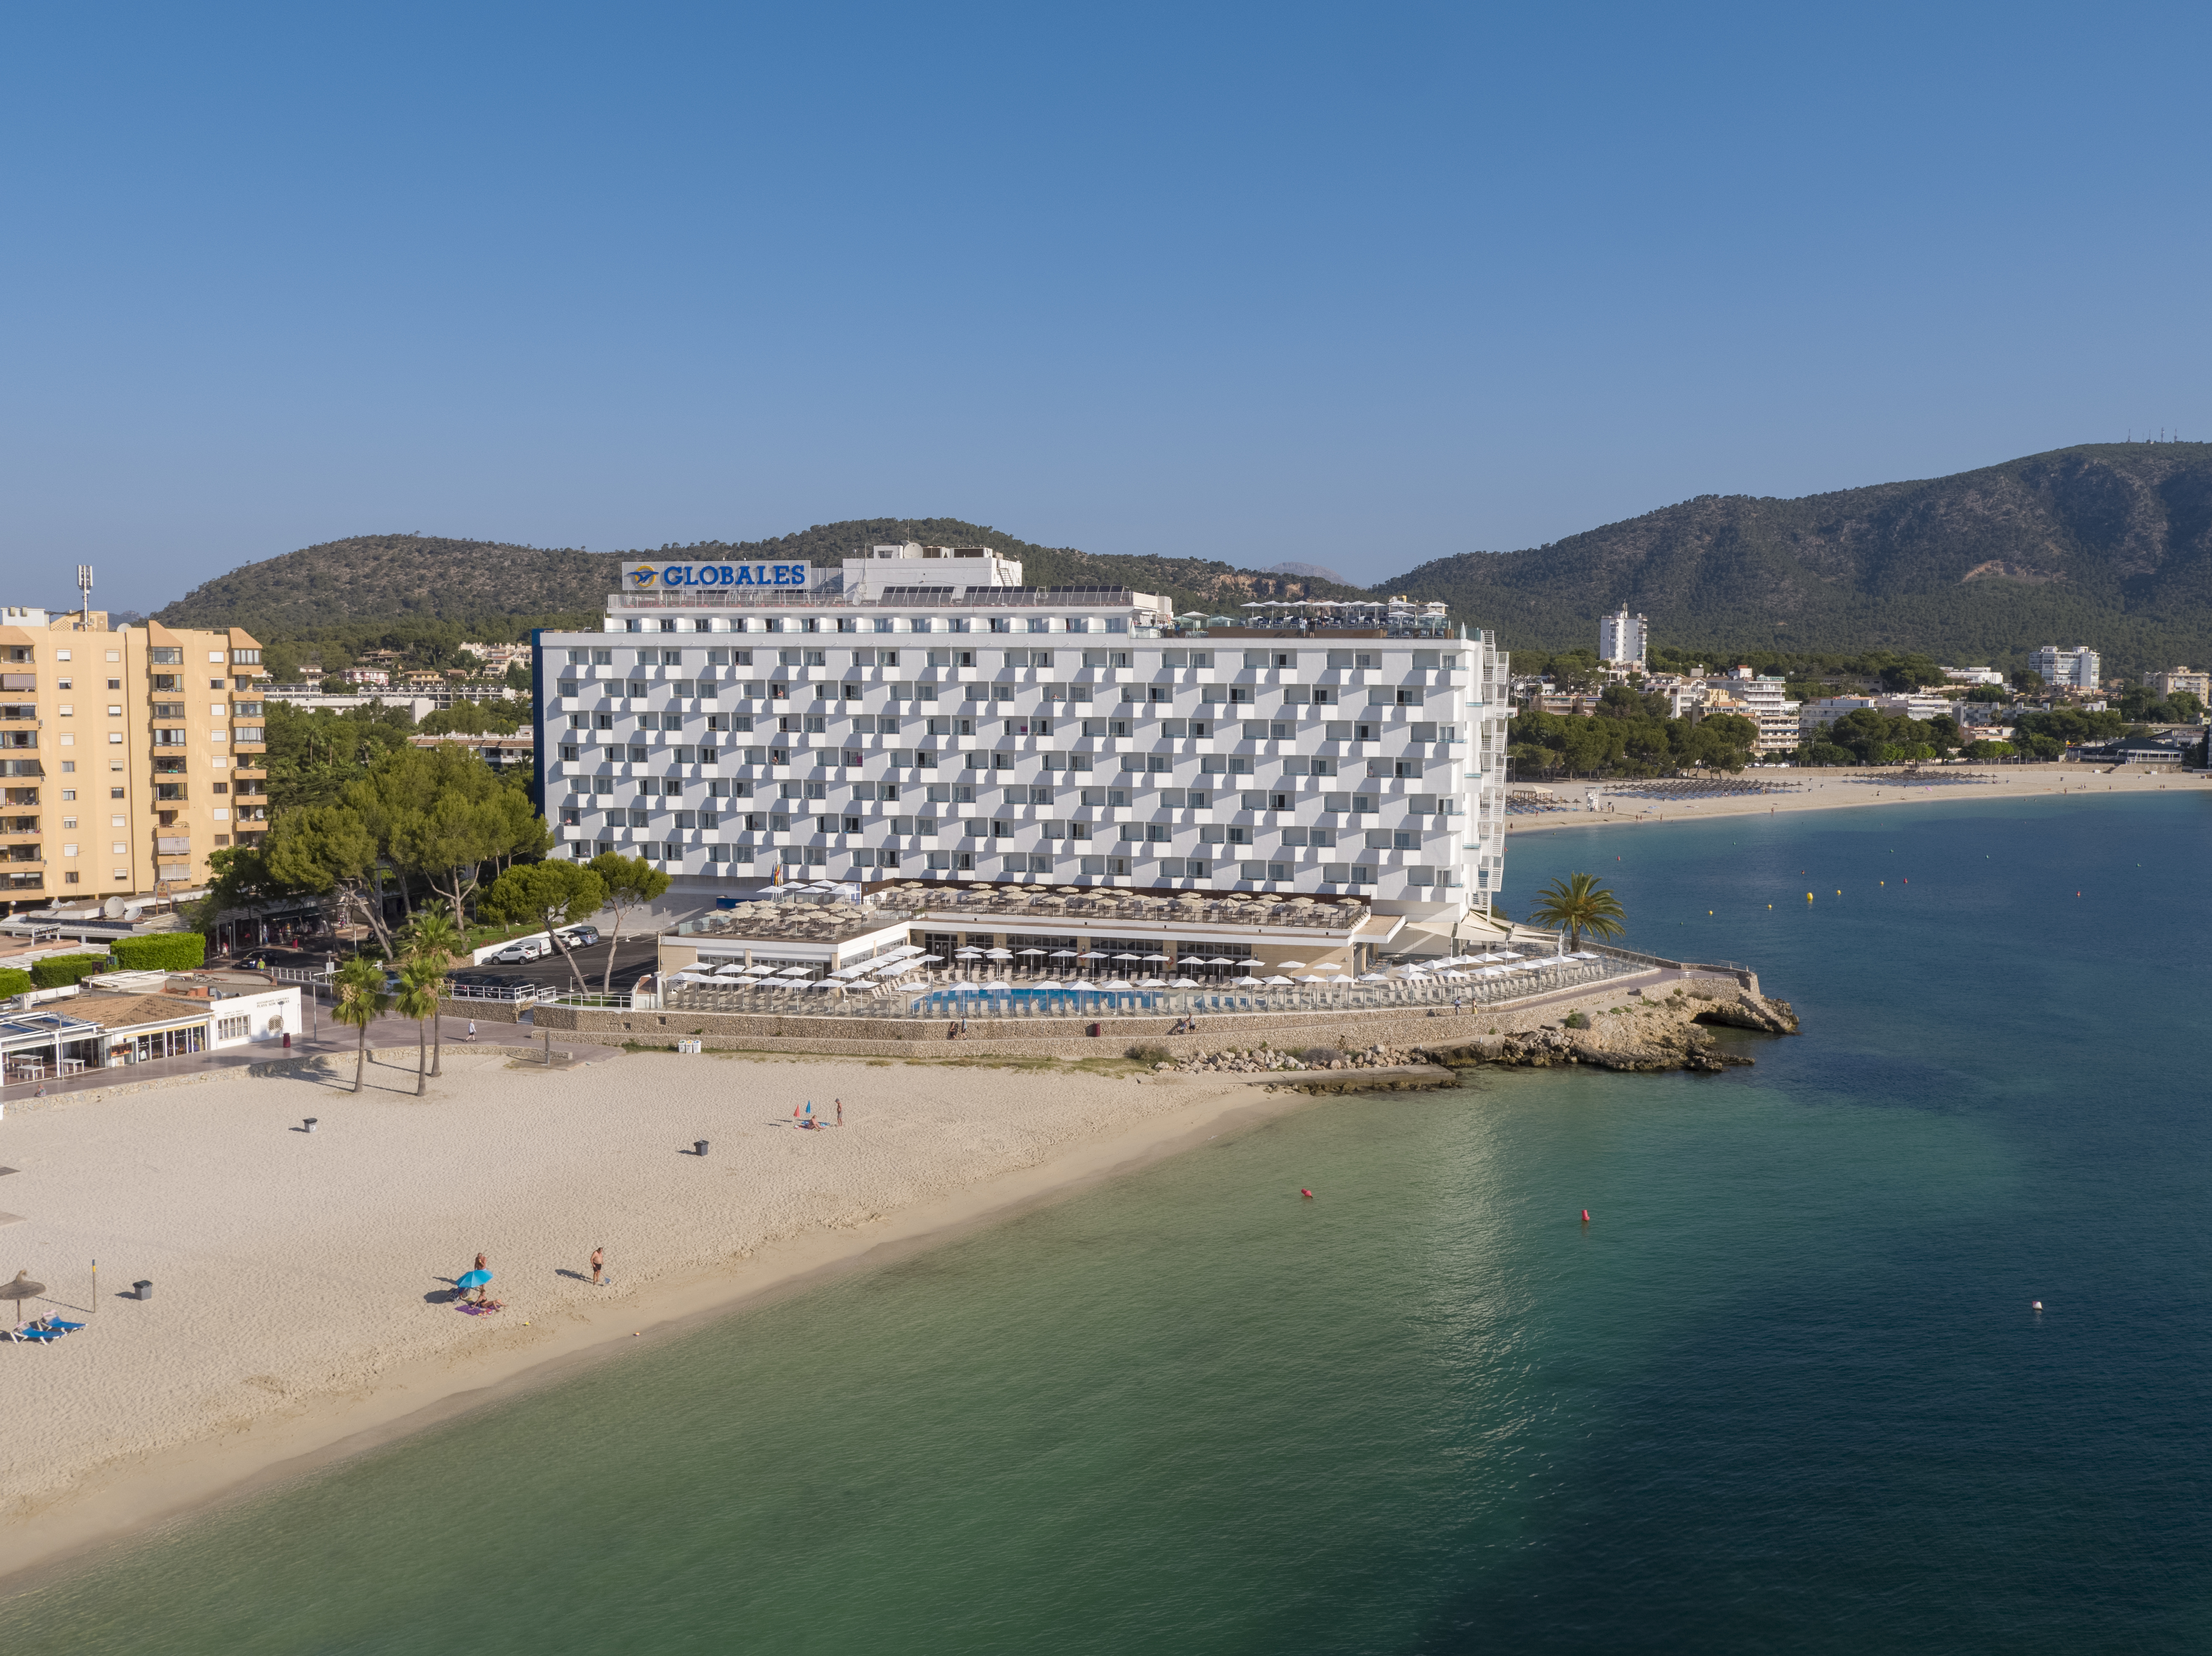 Globales Santa Lucia Hotel, Baleares